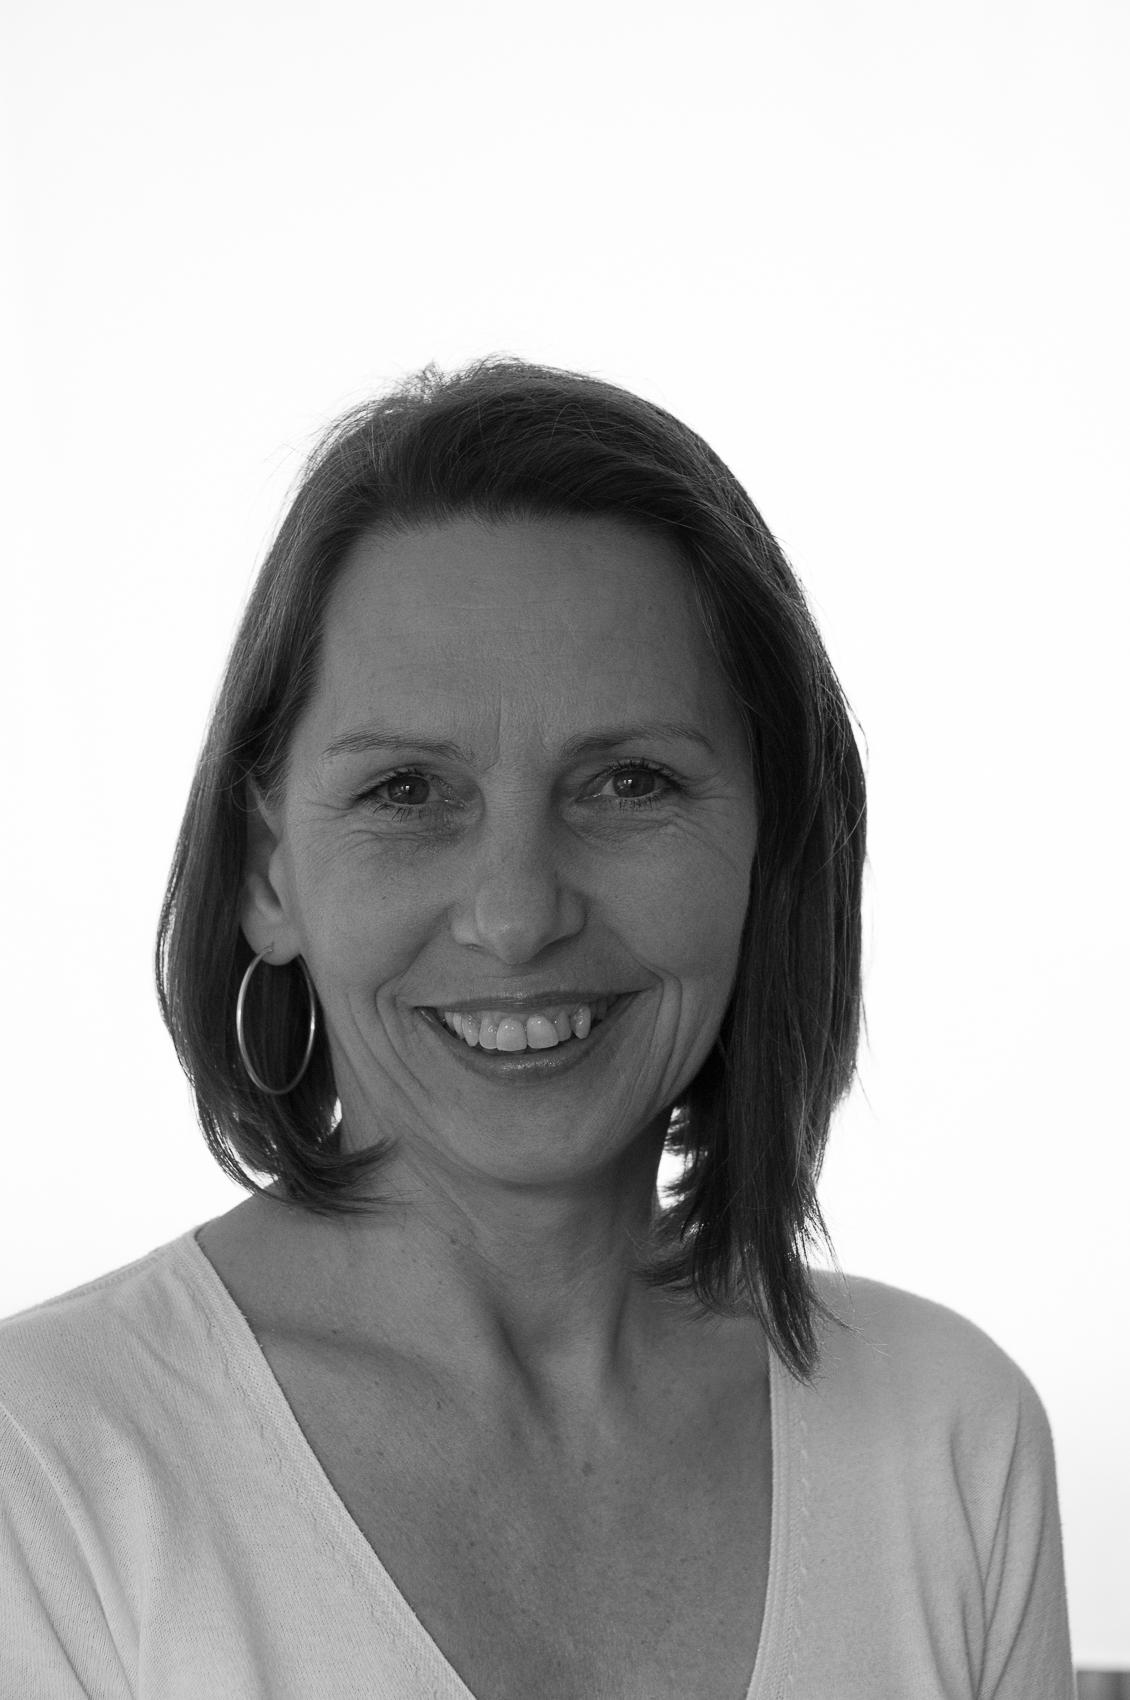 Maria Eder